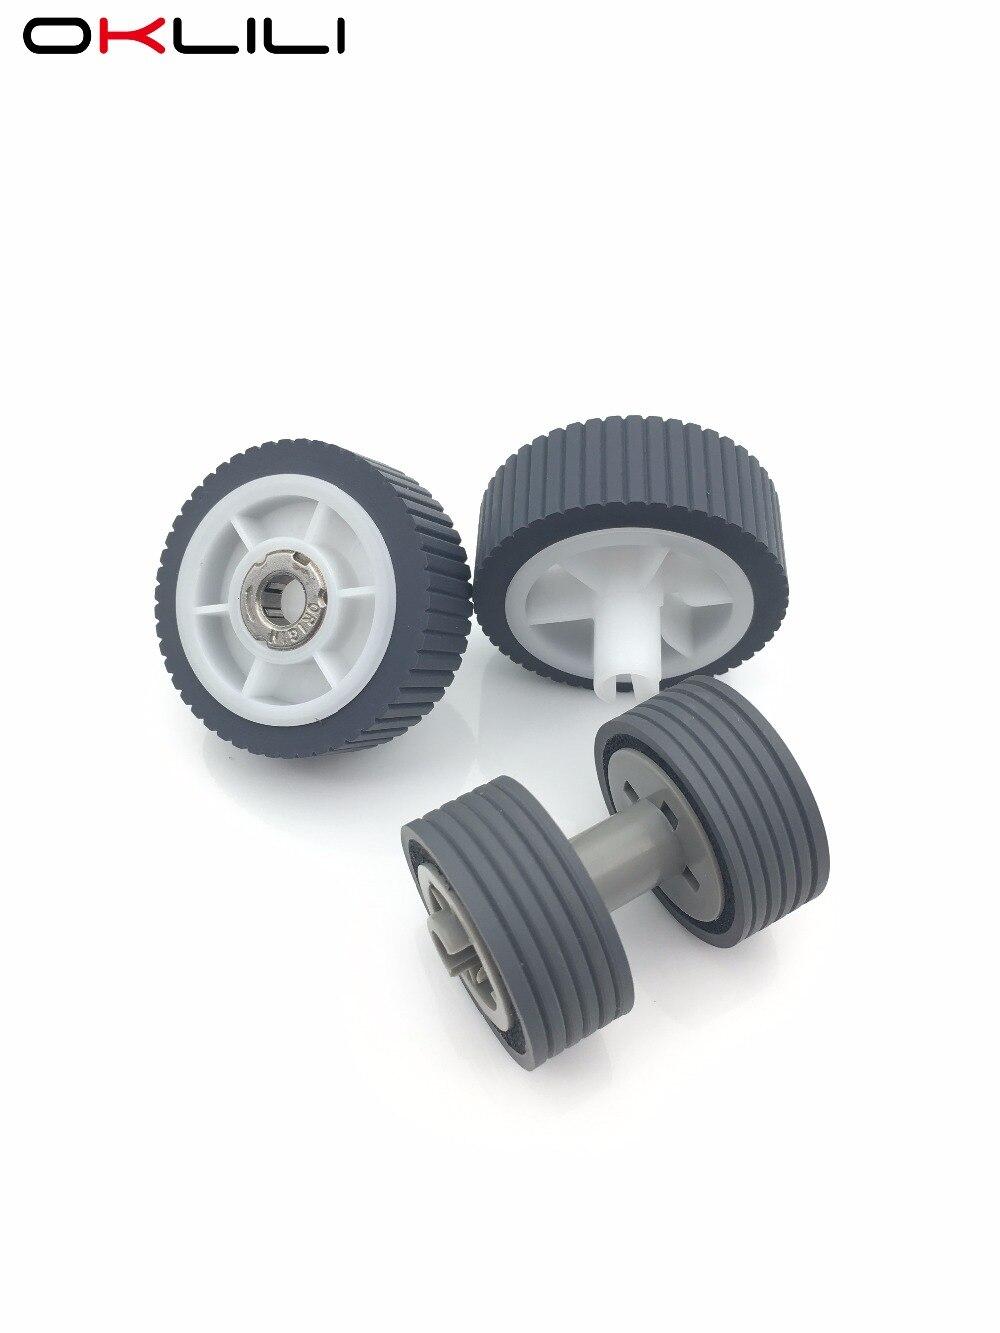 1SETX PA03656-0001 PA03656-E958 PA03656-E976 Brake Roller & Pick Roller Pickup Roller for Fujitsu ScanSnap iX500 цена 2017